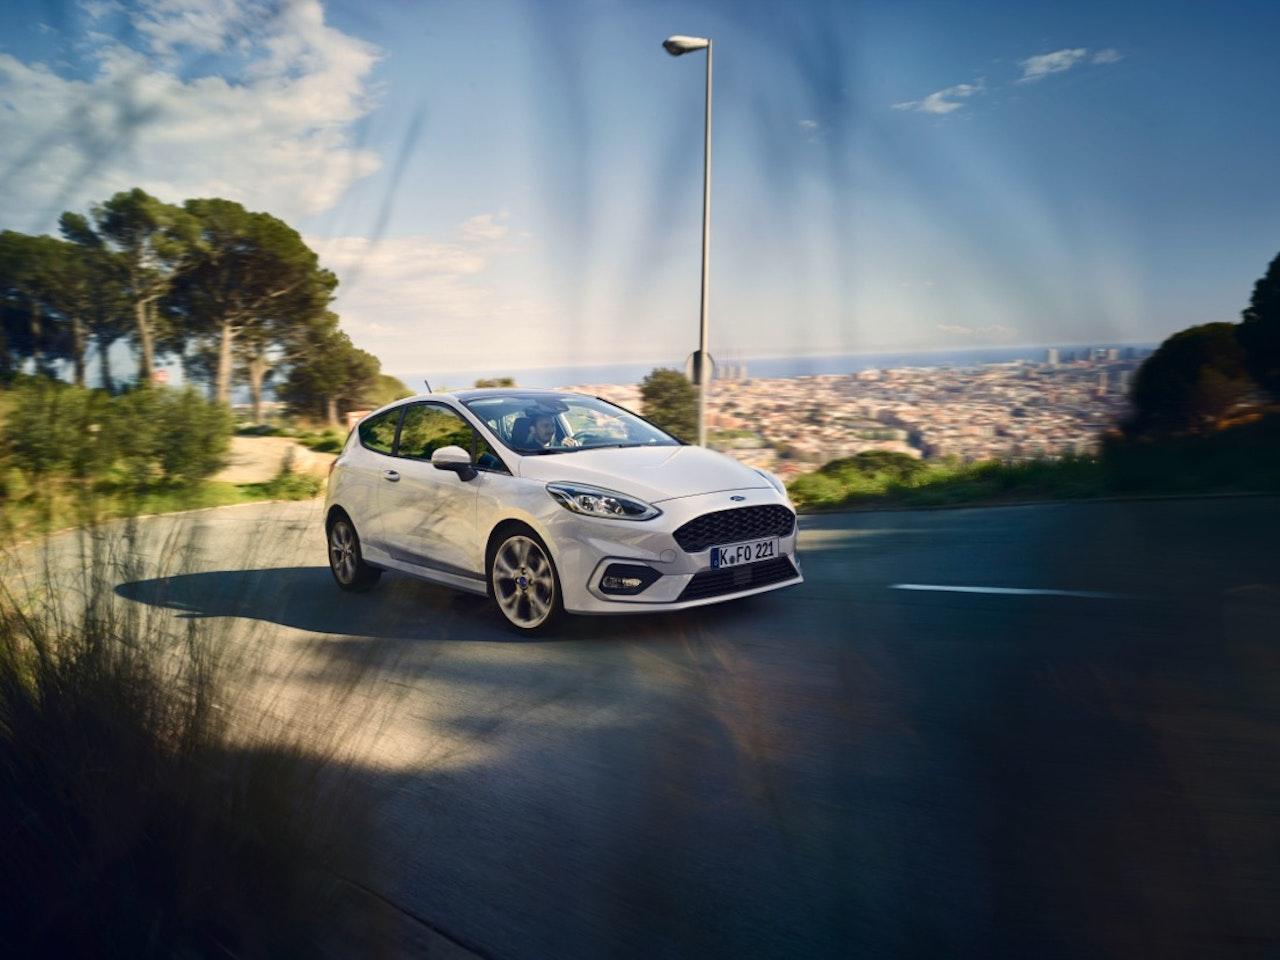 08_Ford_Fiesta_ST_Line_Menorca_BCN_093_v14_K